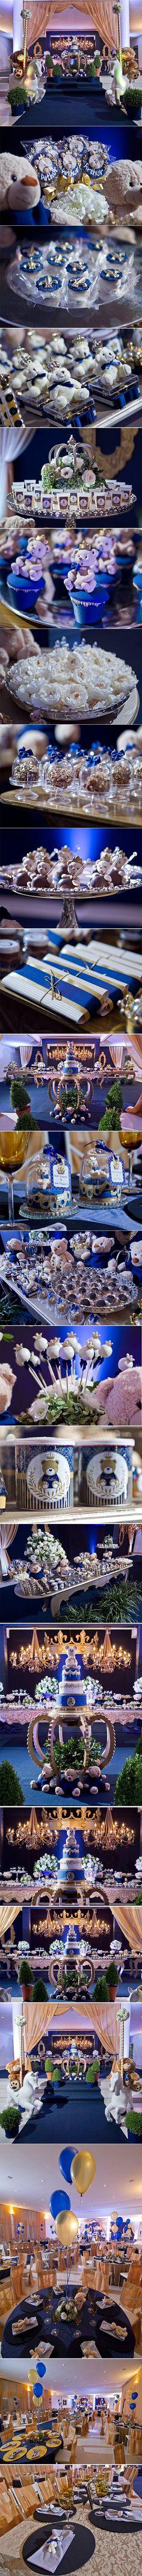 Fesat-Urso-Principe: